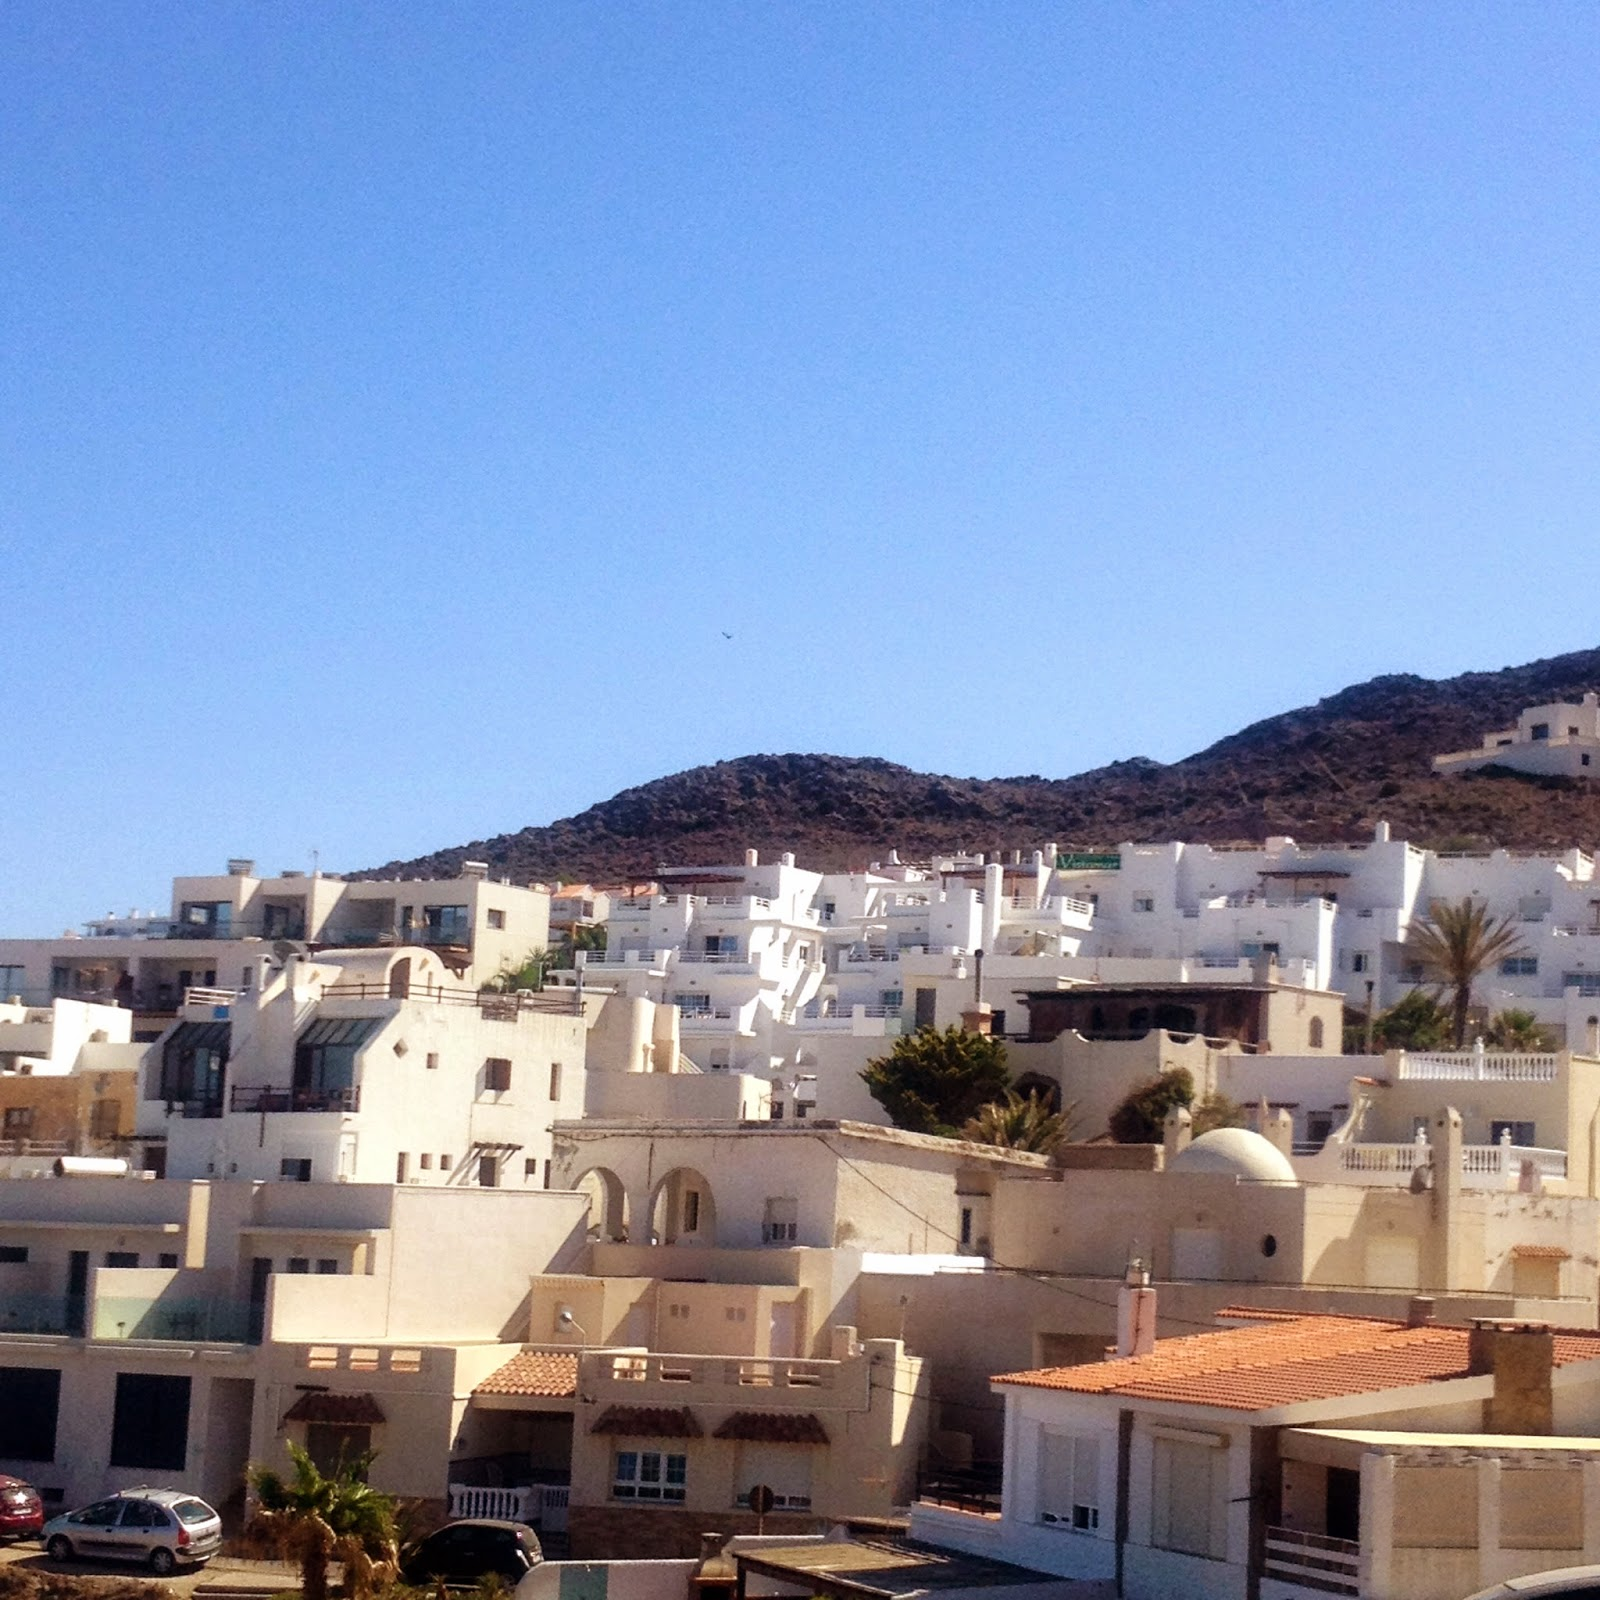 Almeria impresionante san jose almeria 2014 casas - Casas en san jose almeria ...